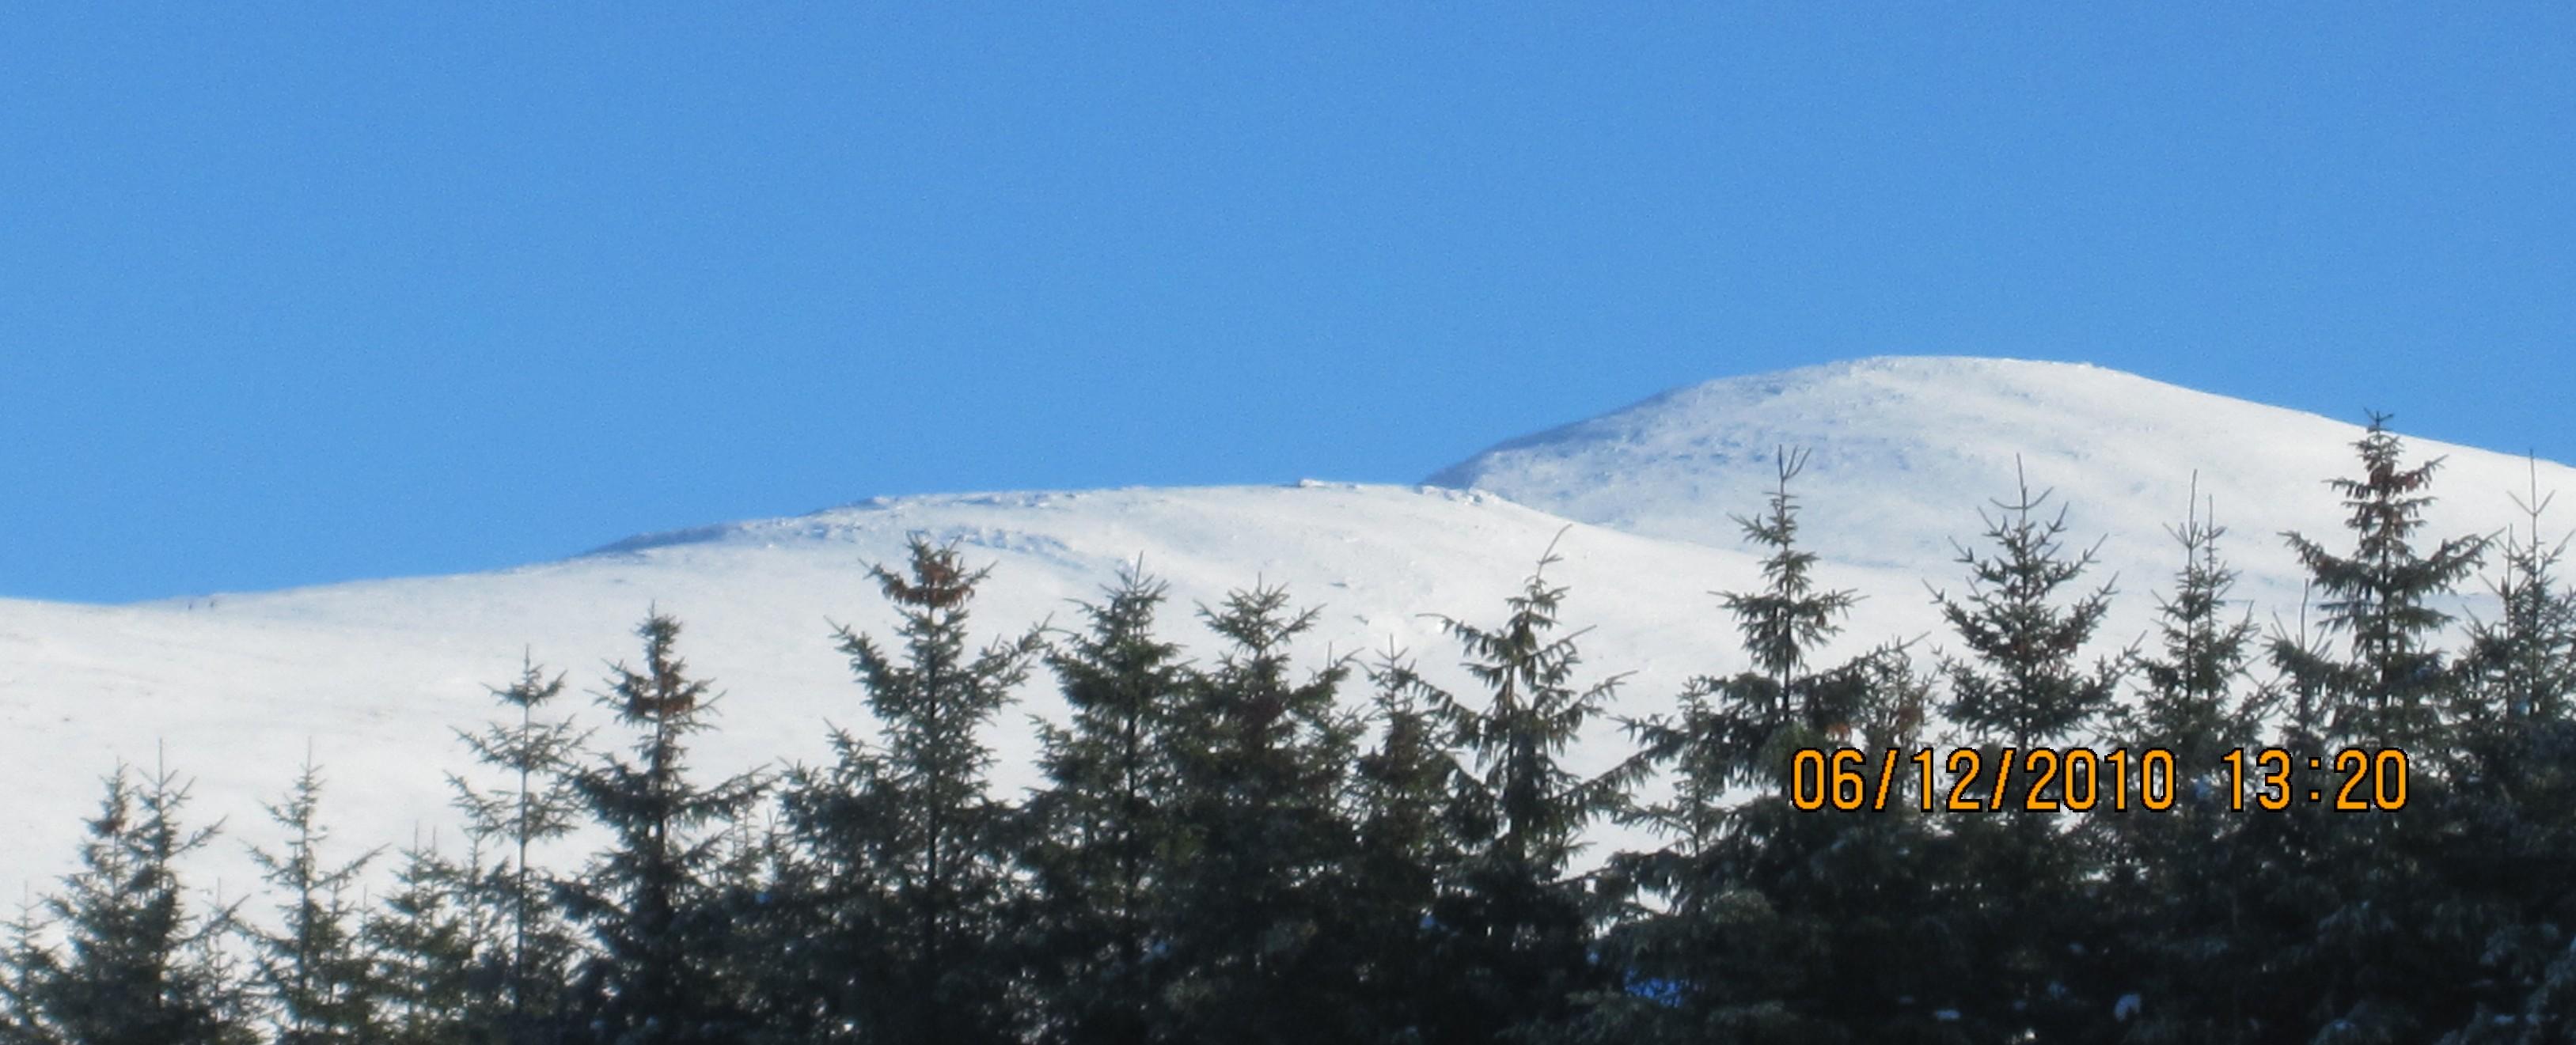 Winter scene in Glen of Imaal